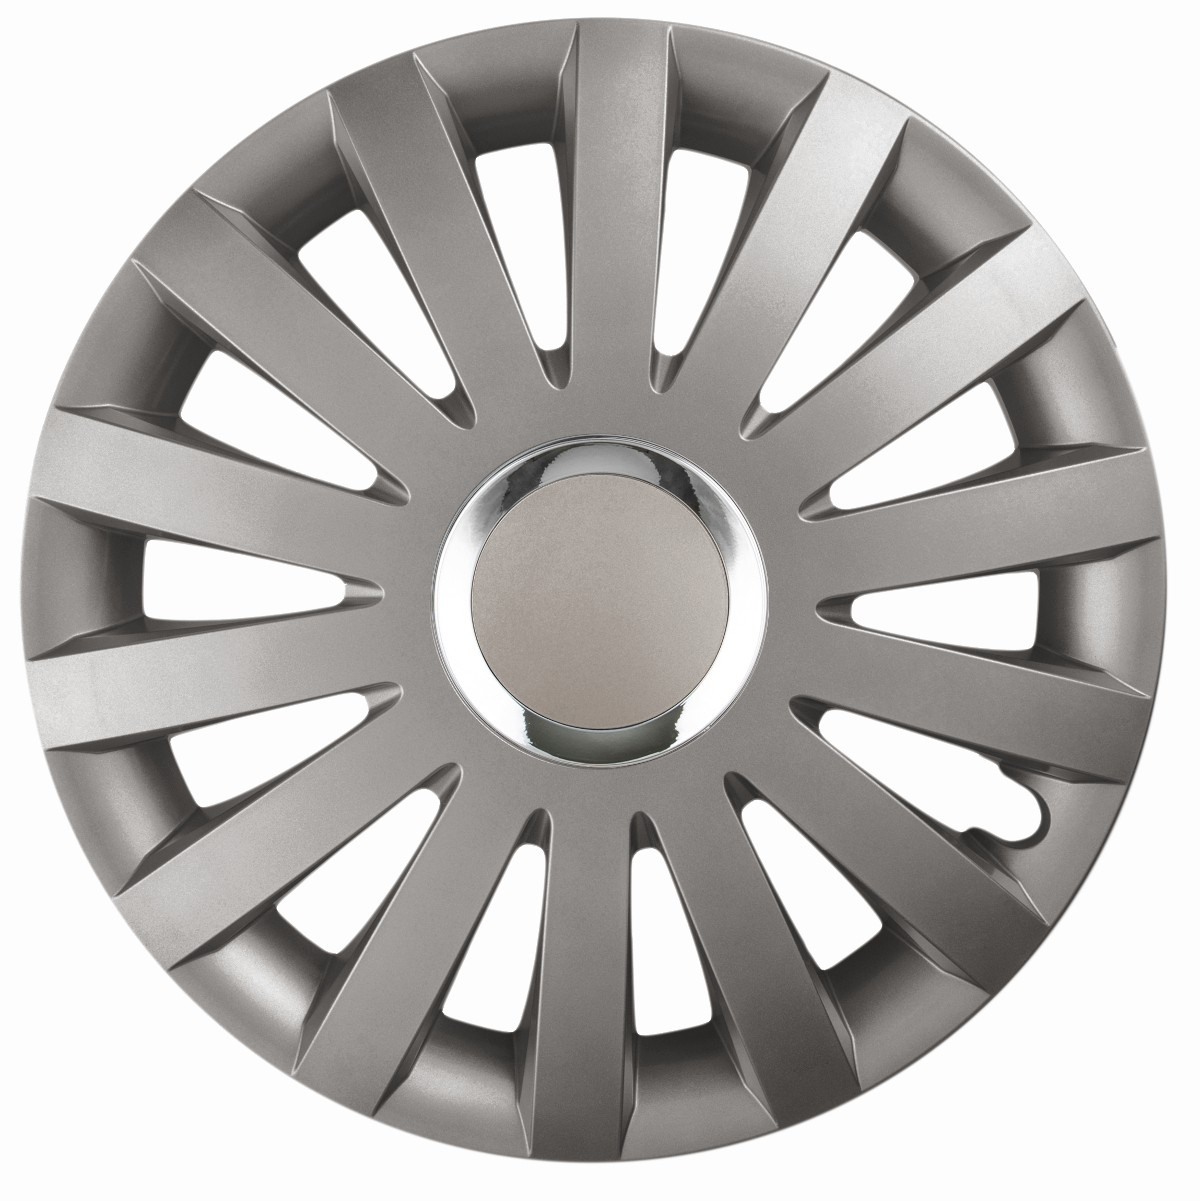 silver//graphite Set of 16/'/' Wheel trims hubcaps for Vauxhall Vivaro